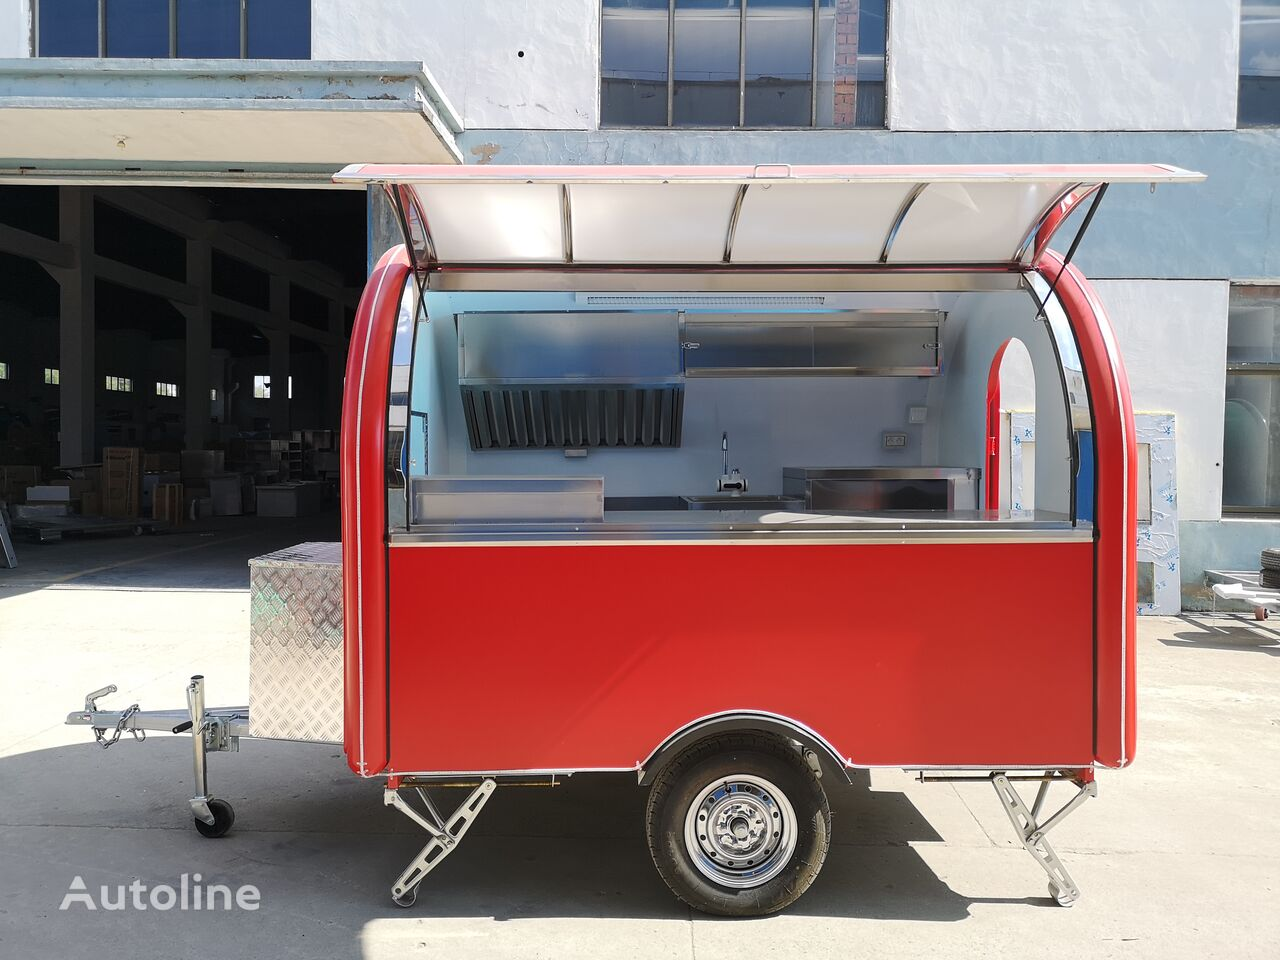 new ERZODA ERZODA Catering trailer | Food Truck | coffee trailer vending trailer